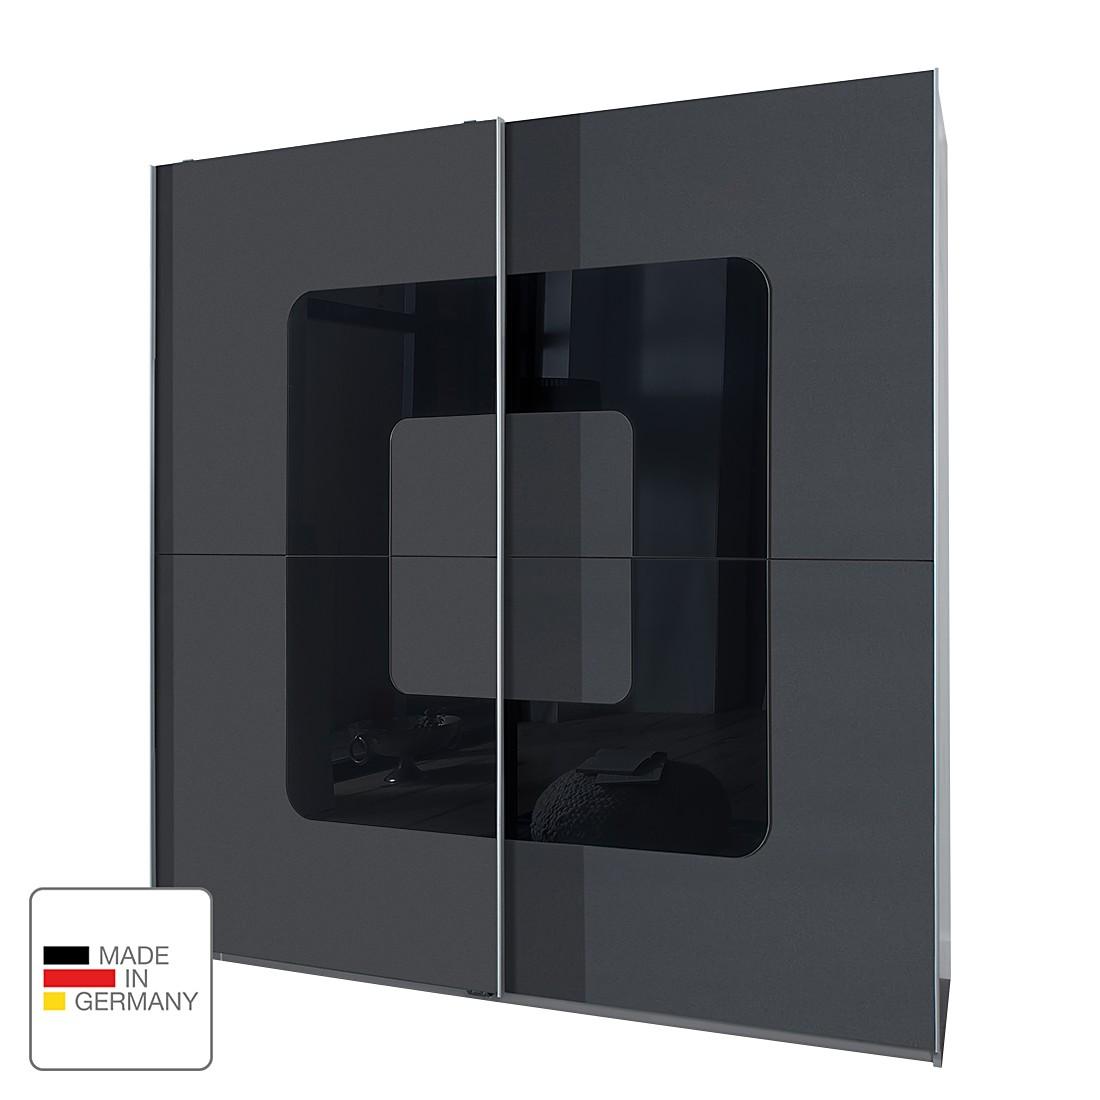 Schuifdeurkast Curve - Antracietkleurig/zwart glas, Wimex